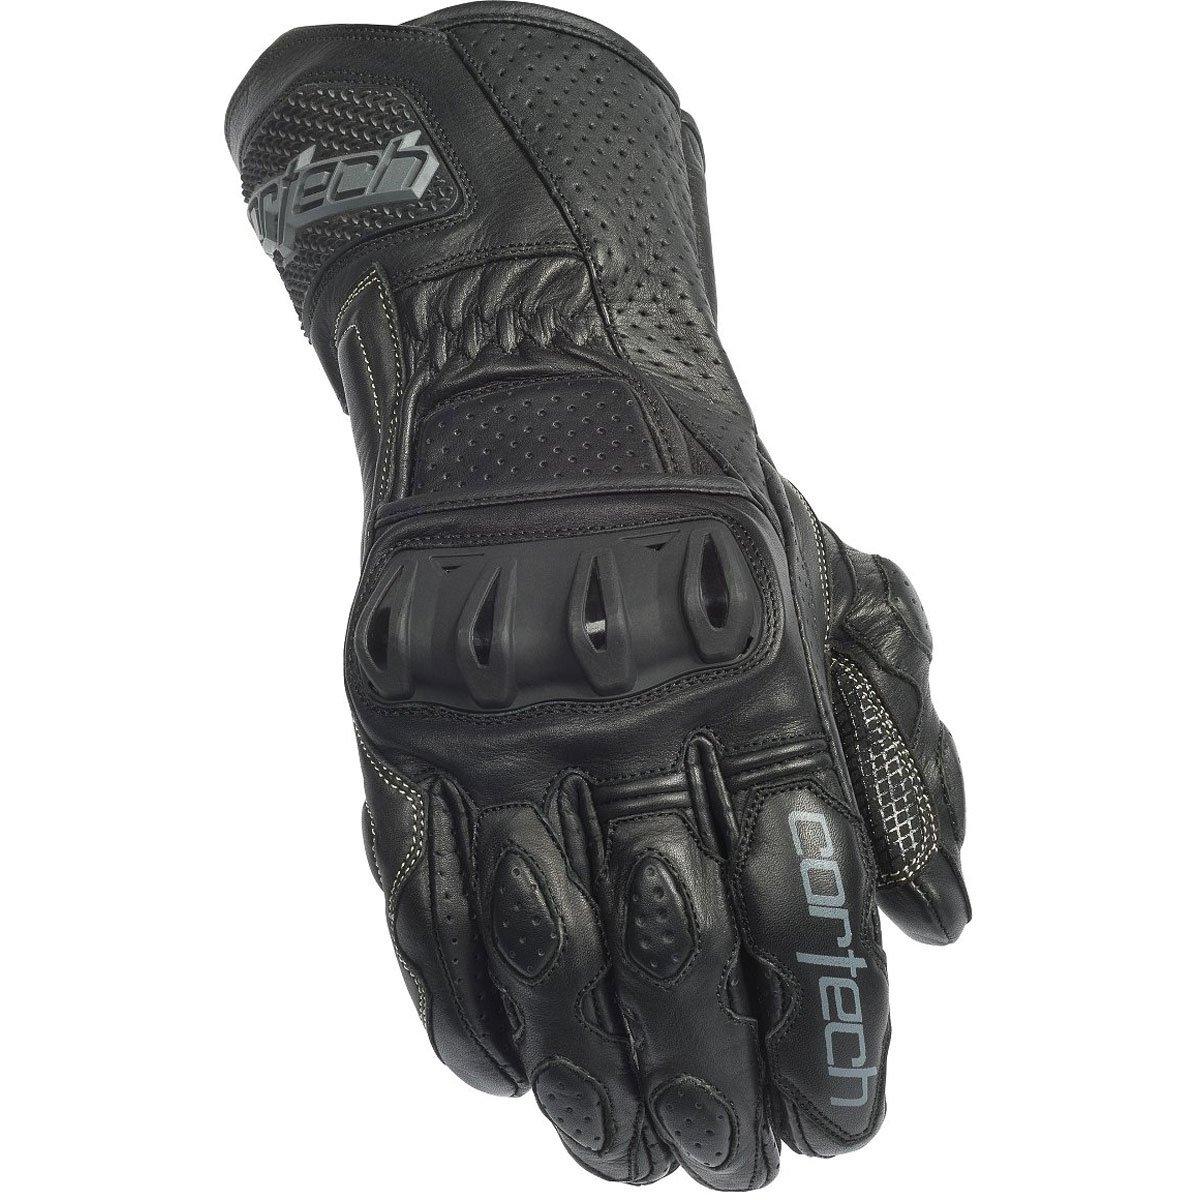 Cortech Latigo 2 RR Mens Leather Sports Bike Motorcycle Gloves - Black/Black / 2X-Large